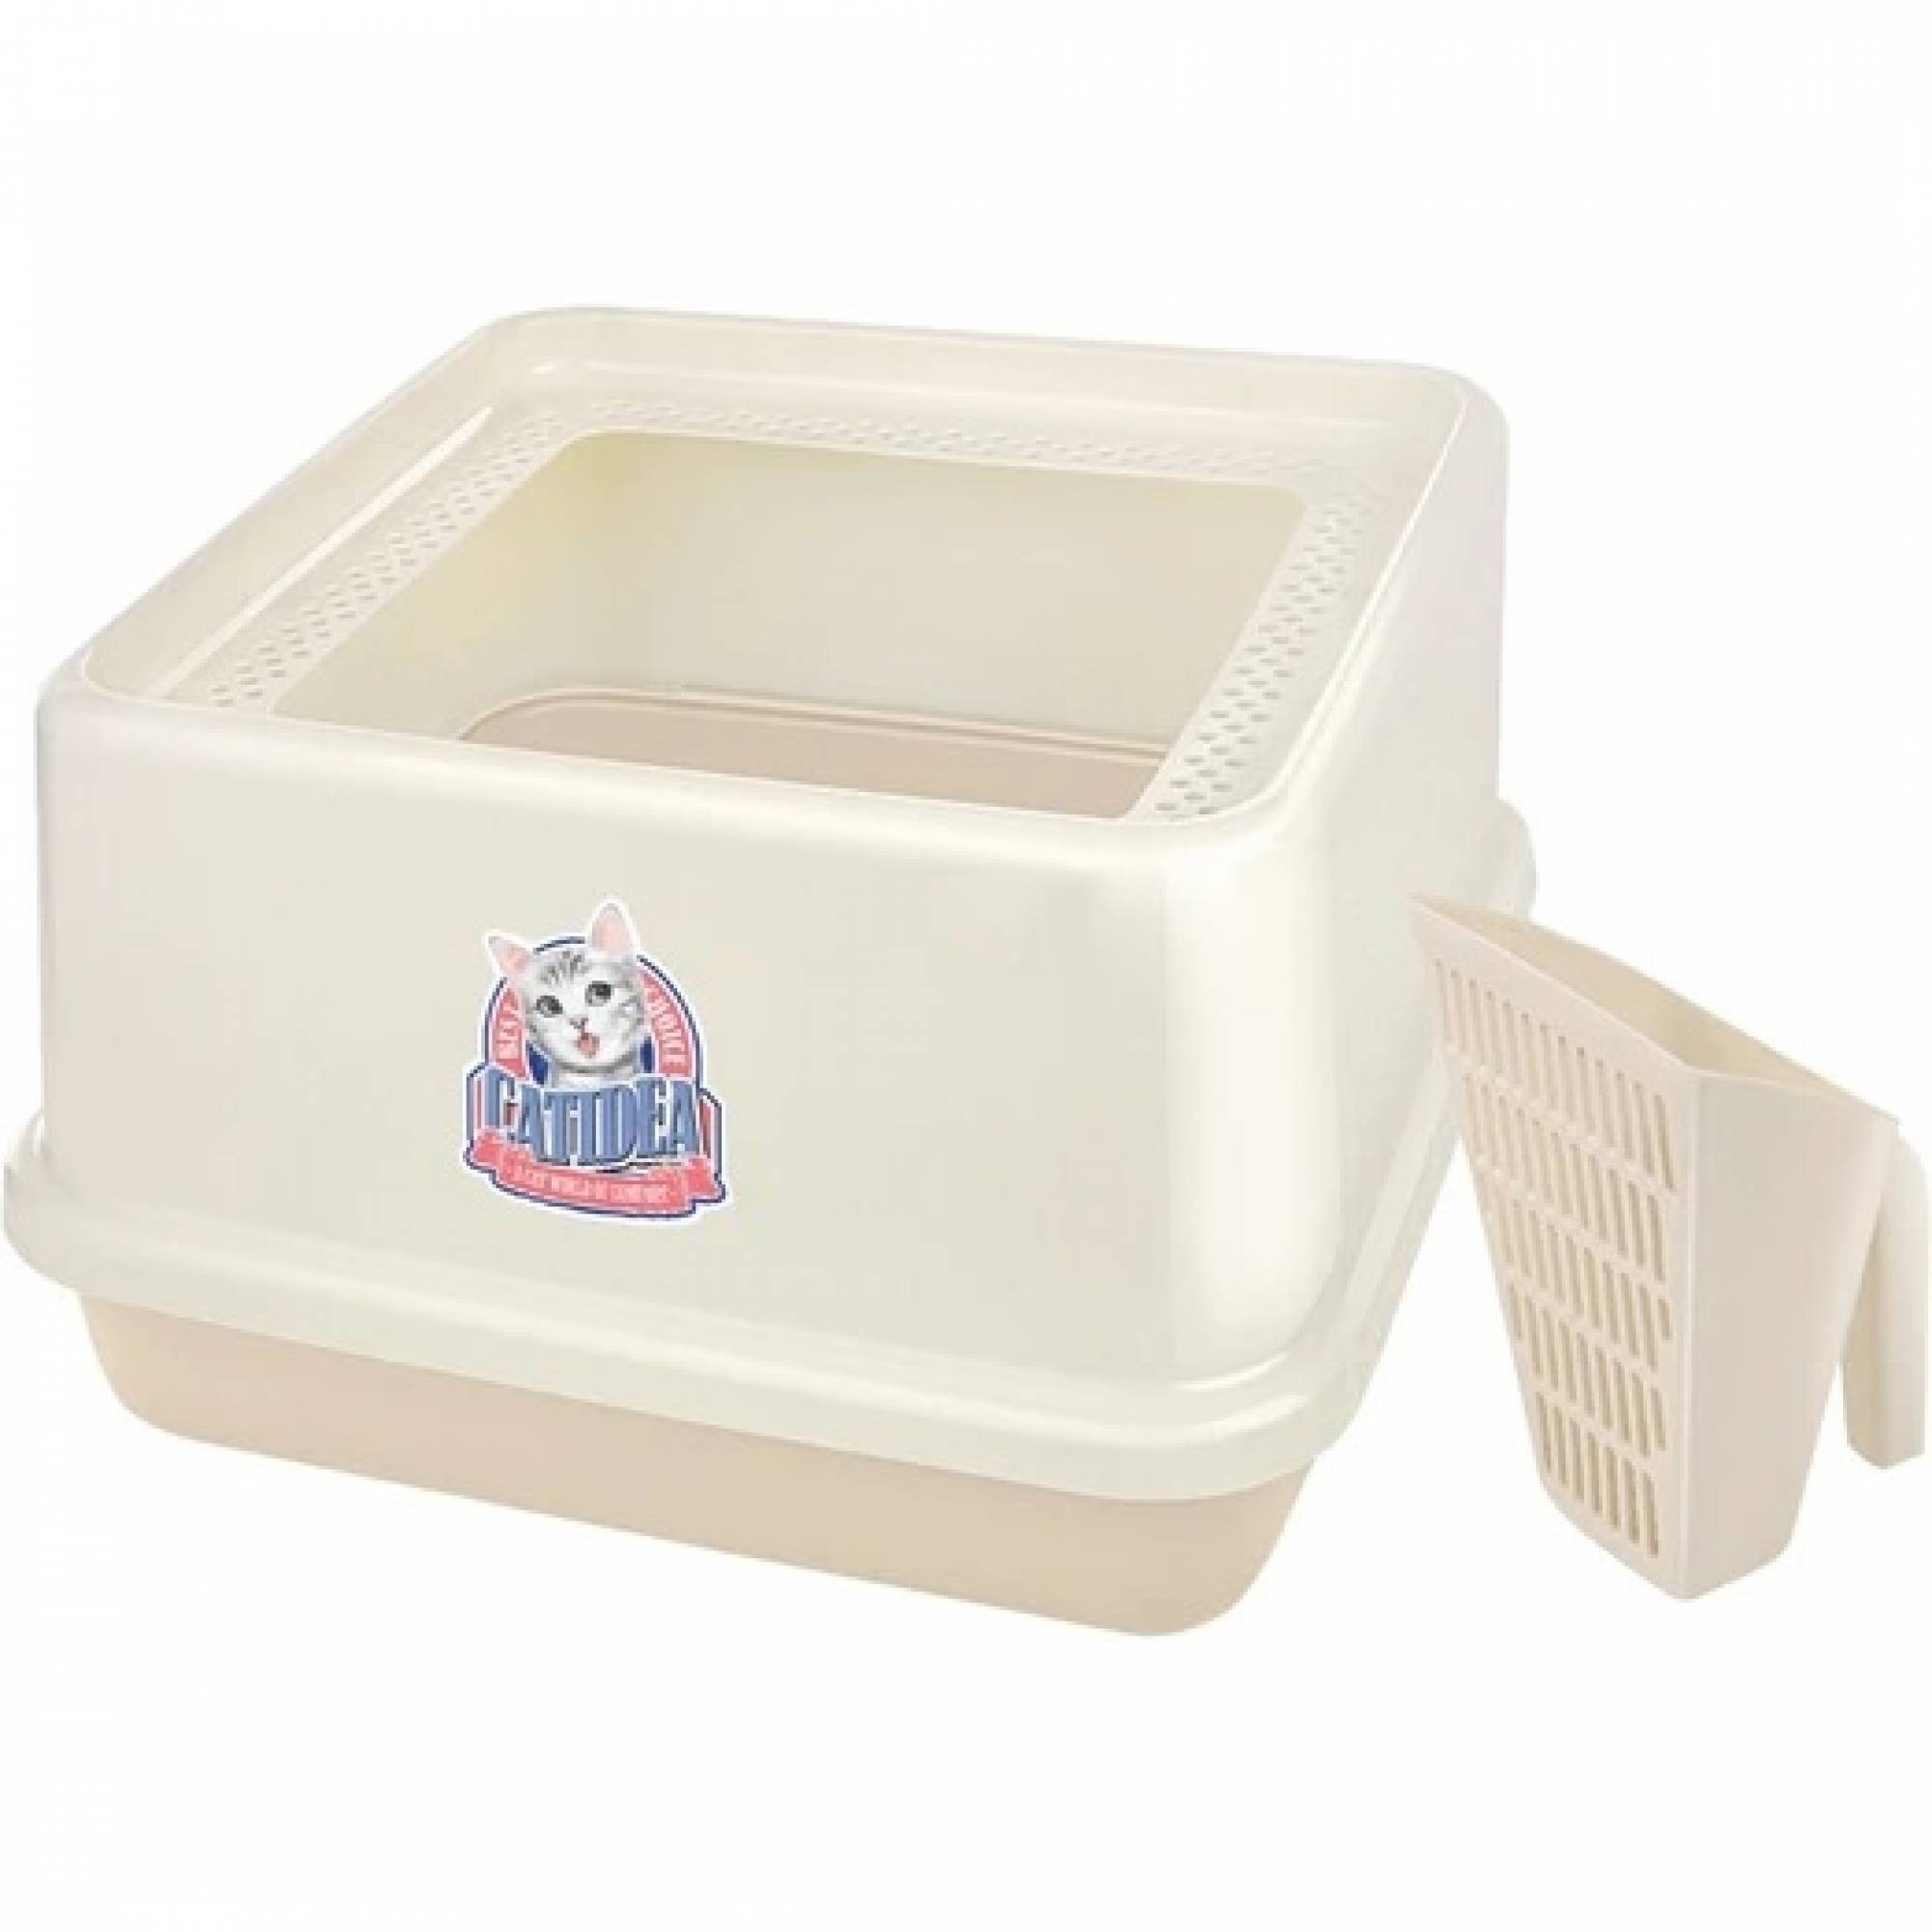 CATIDEA - CL201 Corner Top Entry Cat Litter Box - Cream